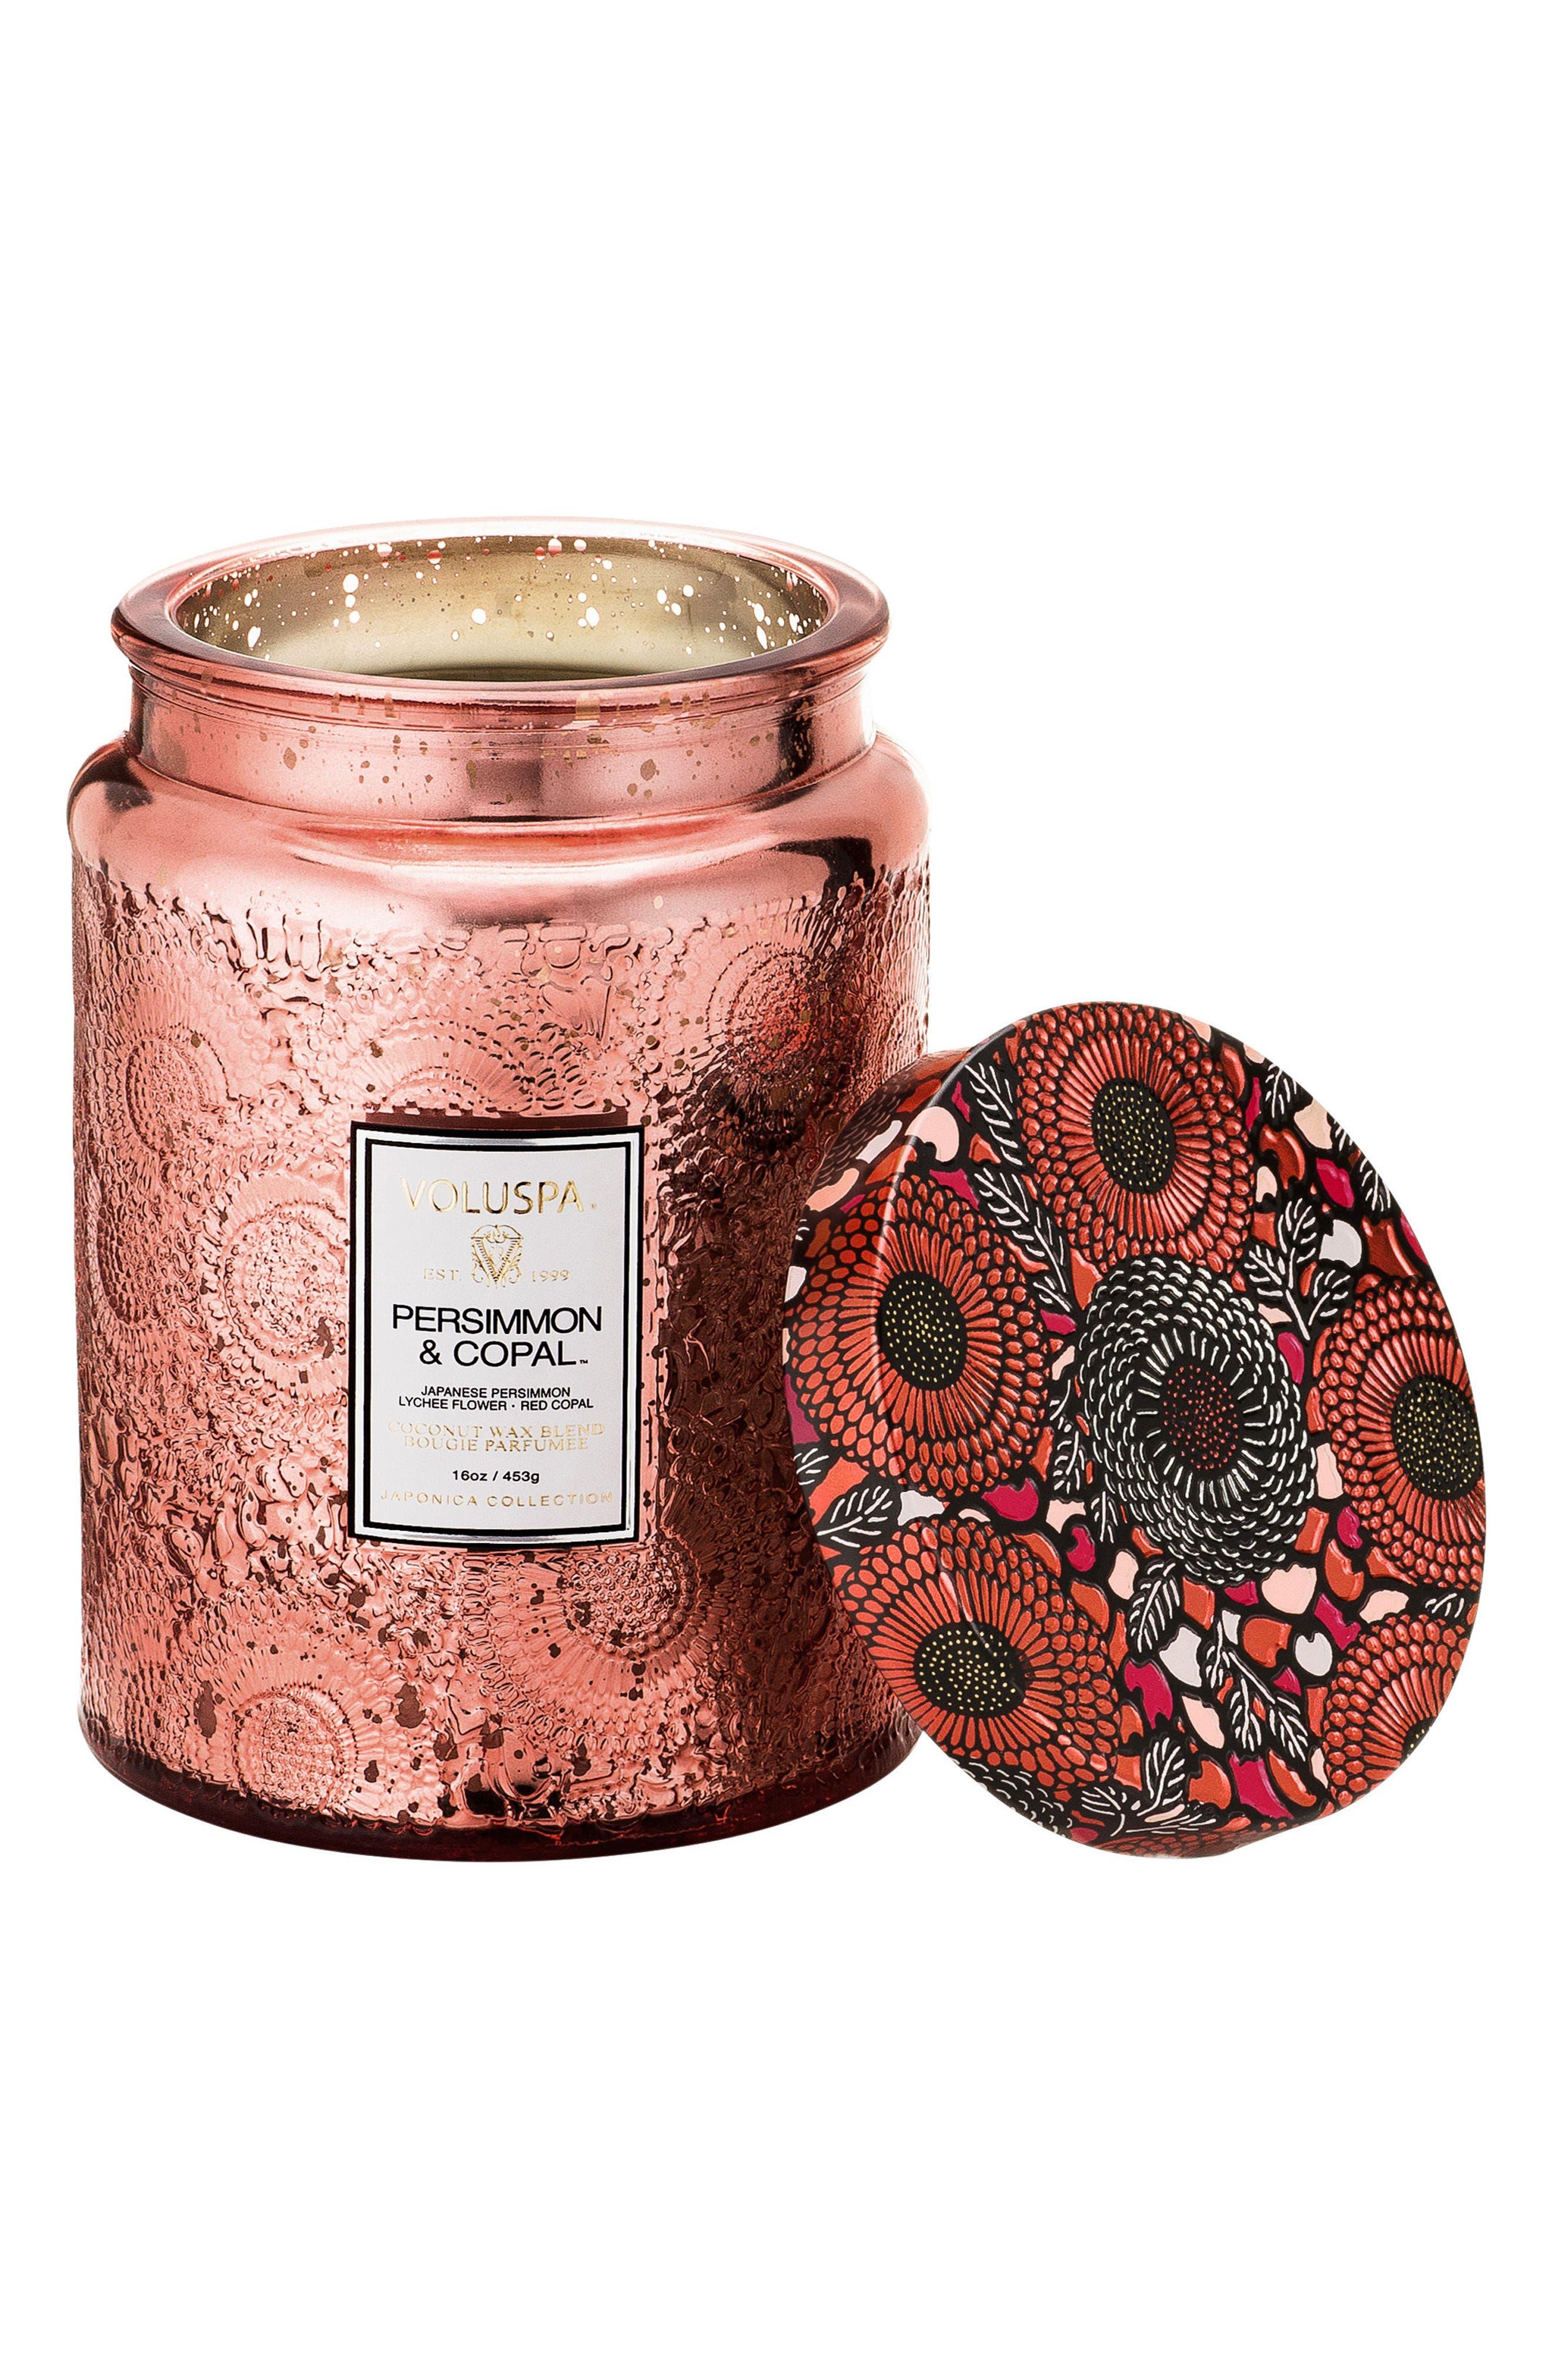 Main Image - Voluspa Japonica - Persimmon & Copal Large Embossed Jar Candle